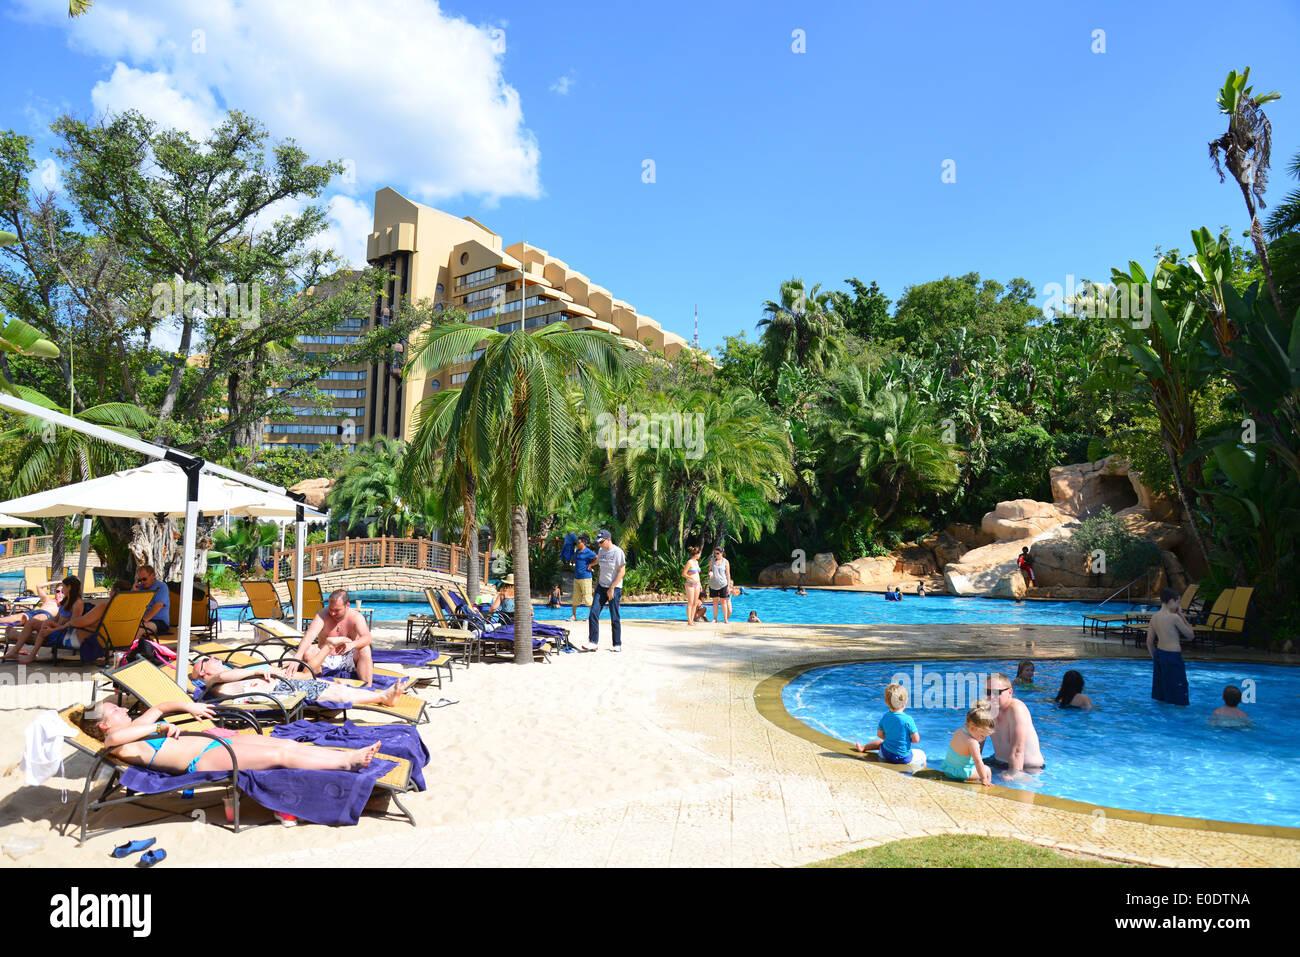 Swimming Pool At Cascades Hotel Sun City Holiday Resort Stock Photo Royalty Free Image